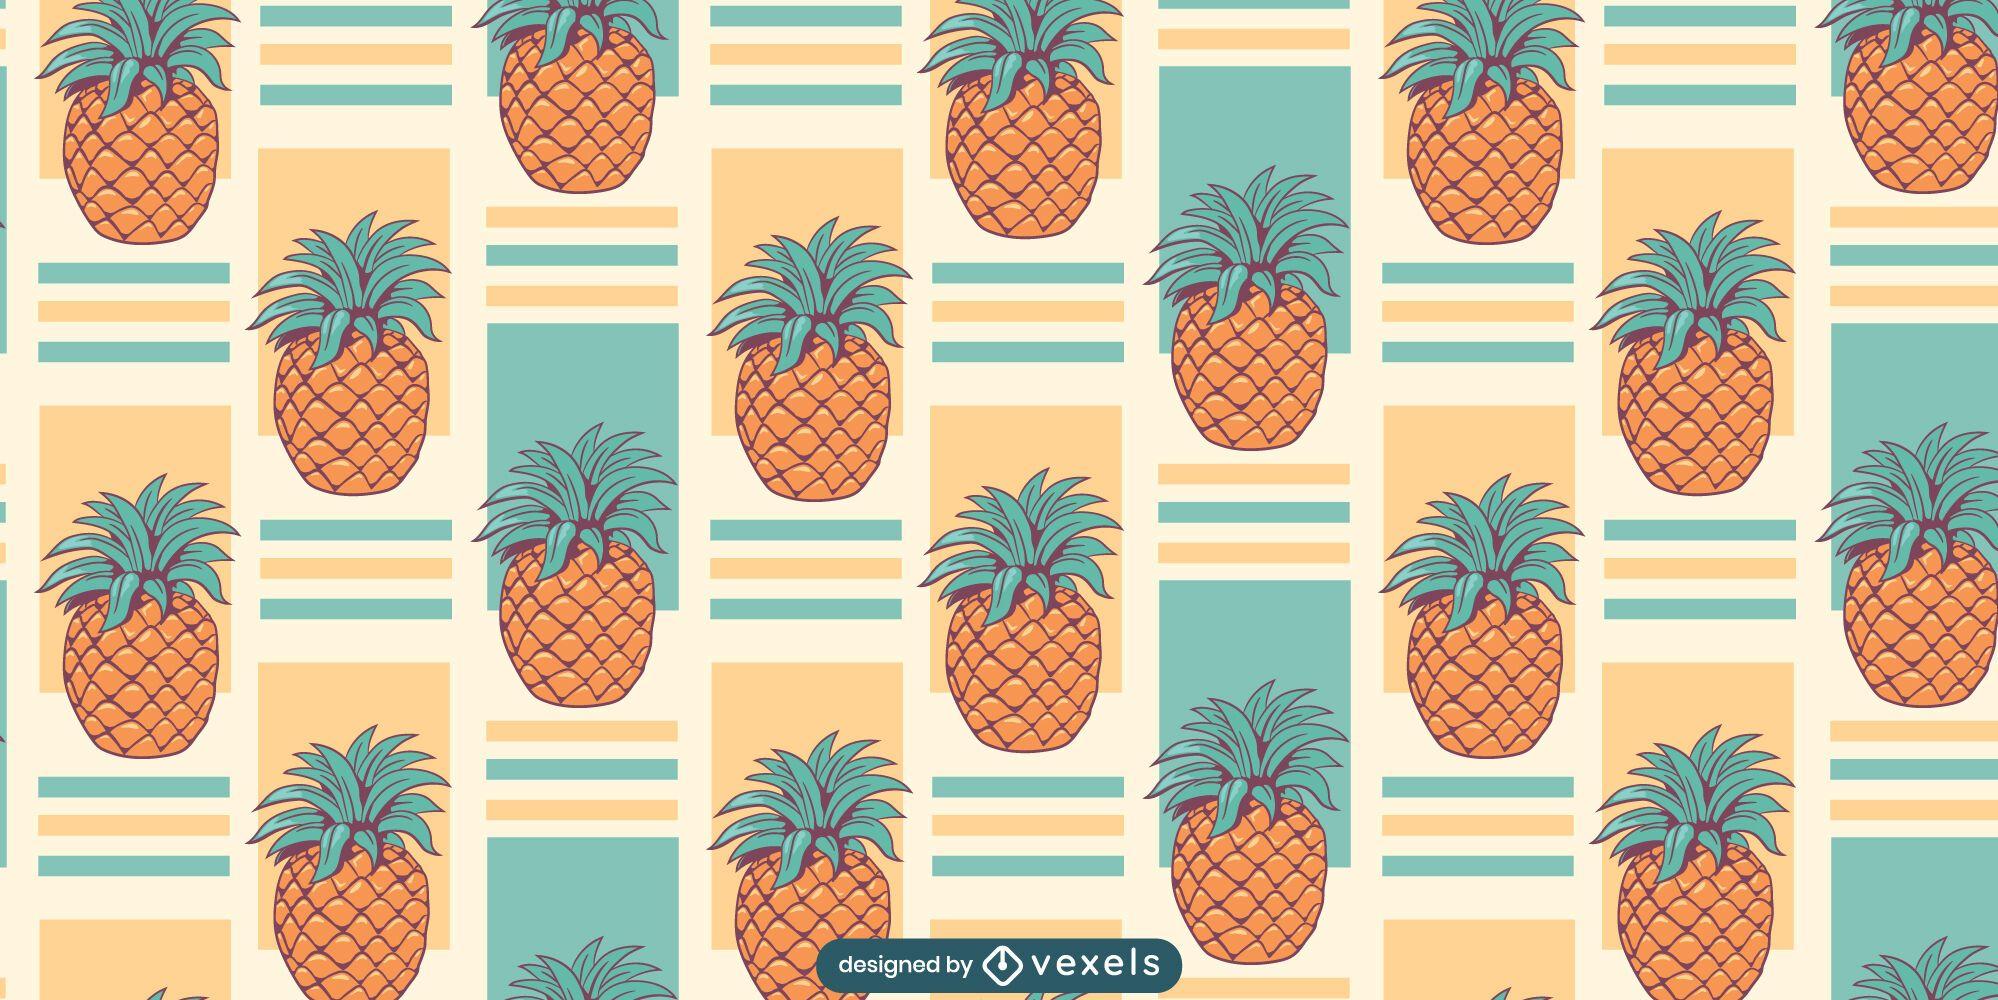 Pineapple fruits pattern design